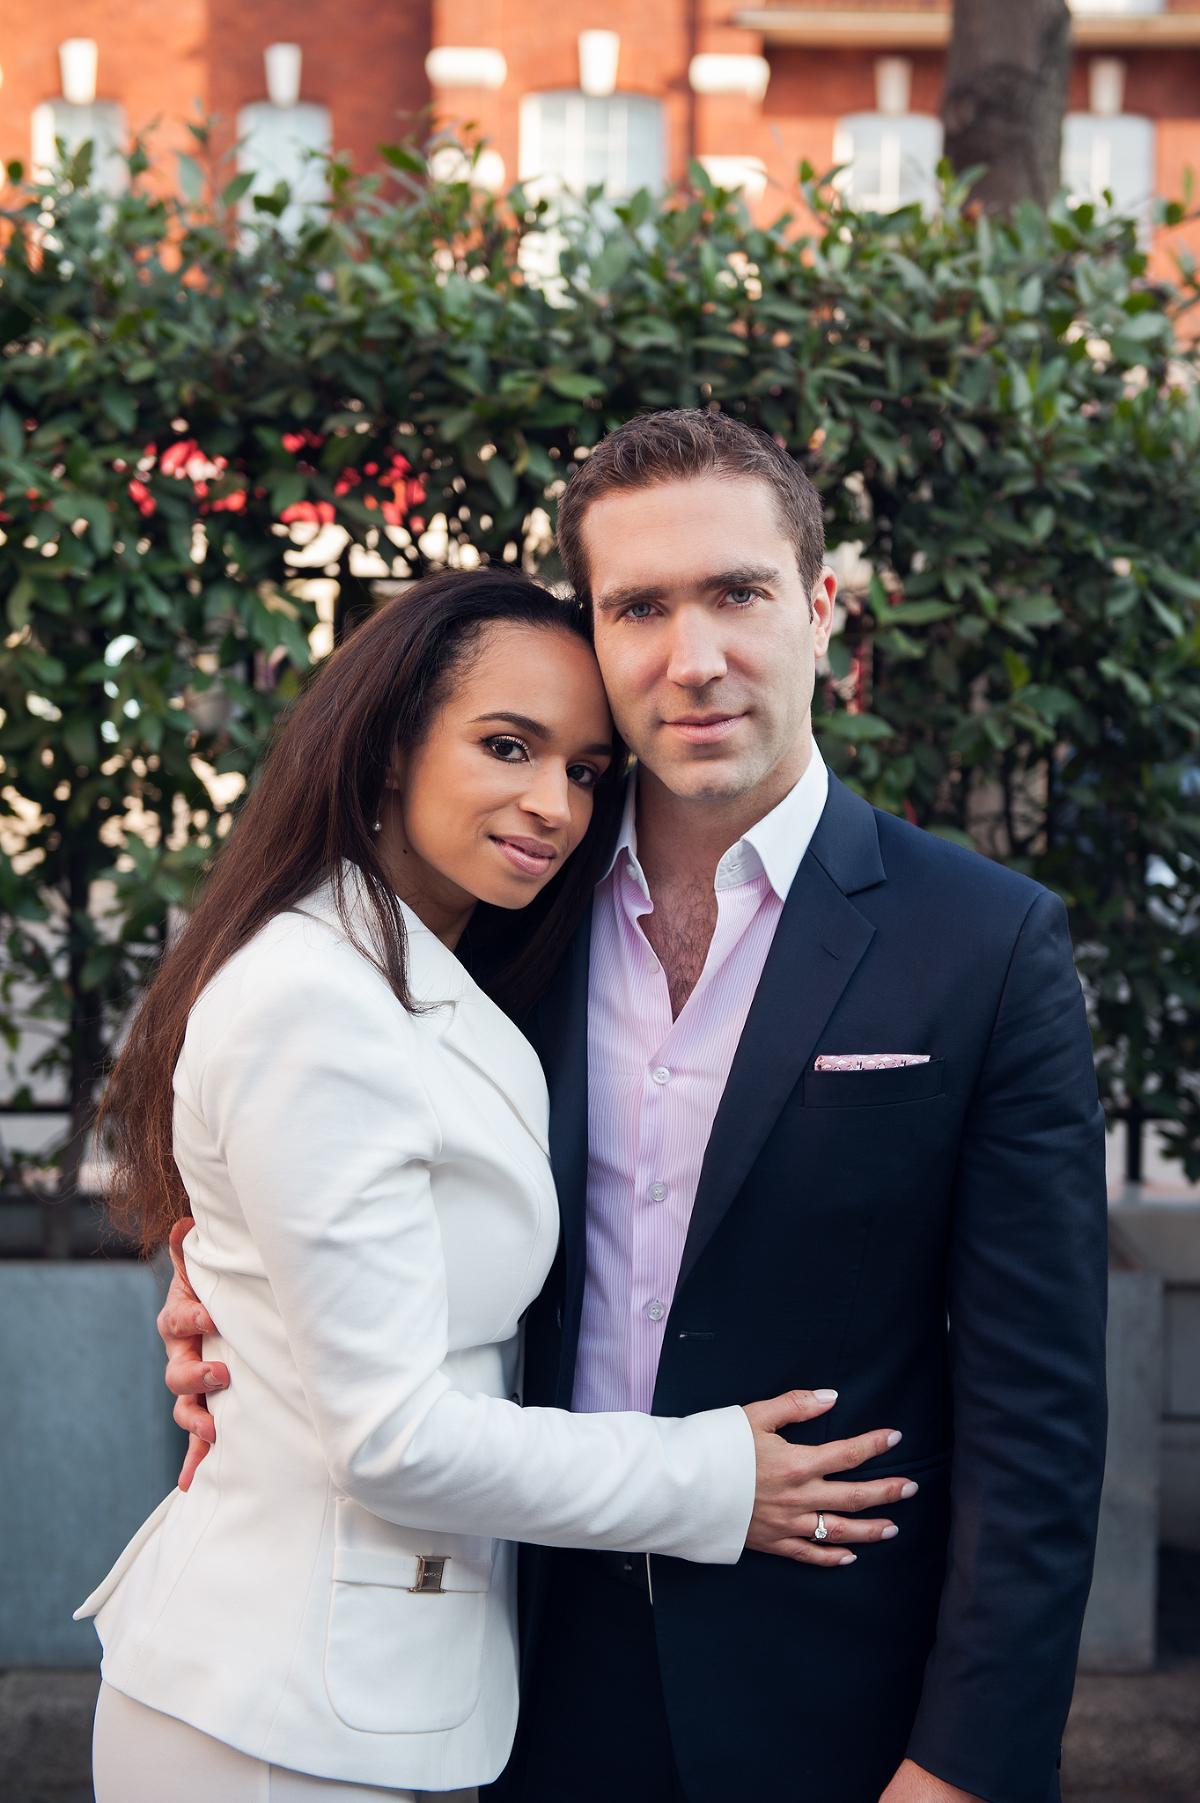 Wedding photo of bride and groom in Chelsea